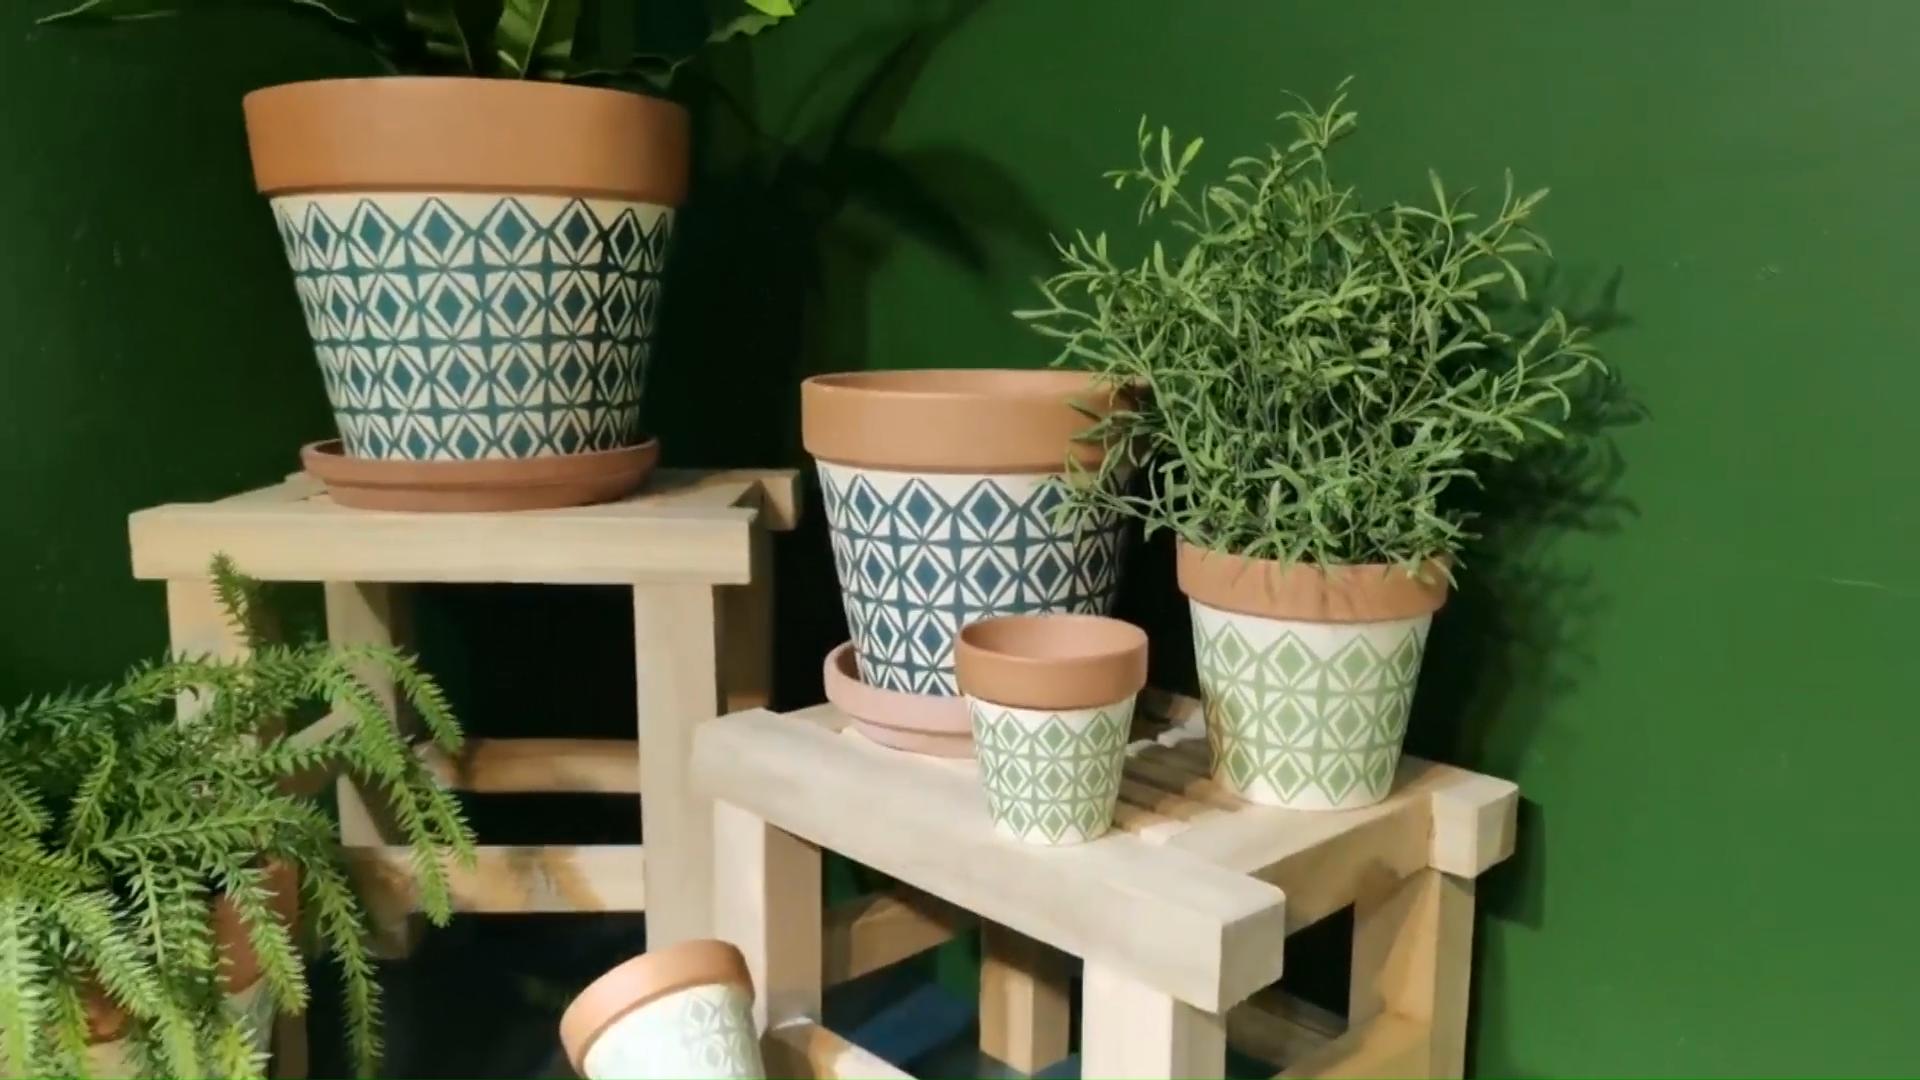 Home garden terracotta orchid planter pots / modern simple home decoration ceramic flower pot